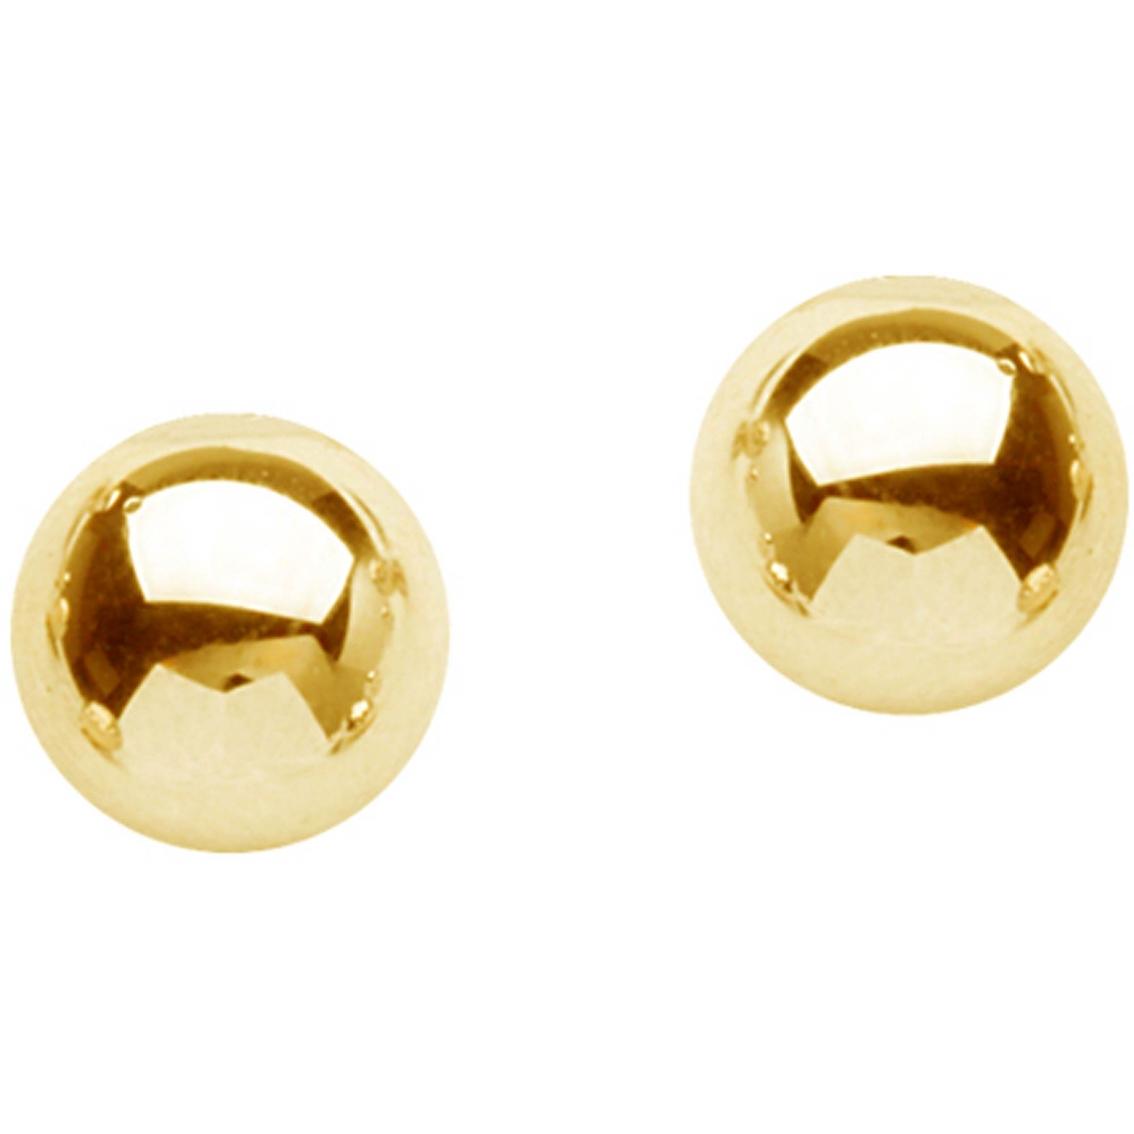 14K Yellow Gold 4mm Ball Earrings